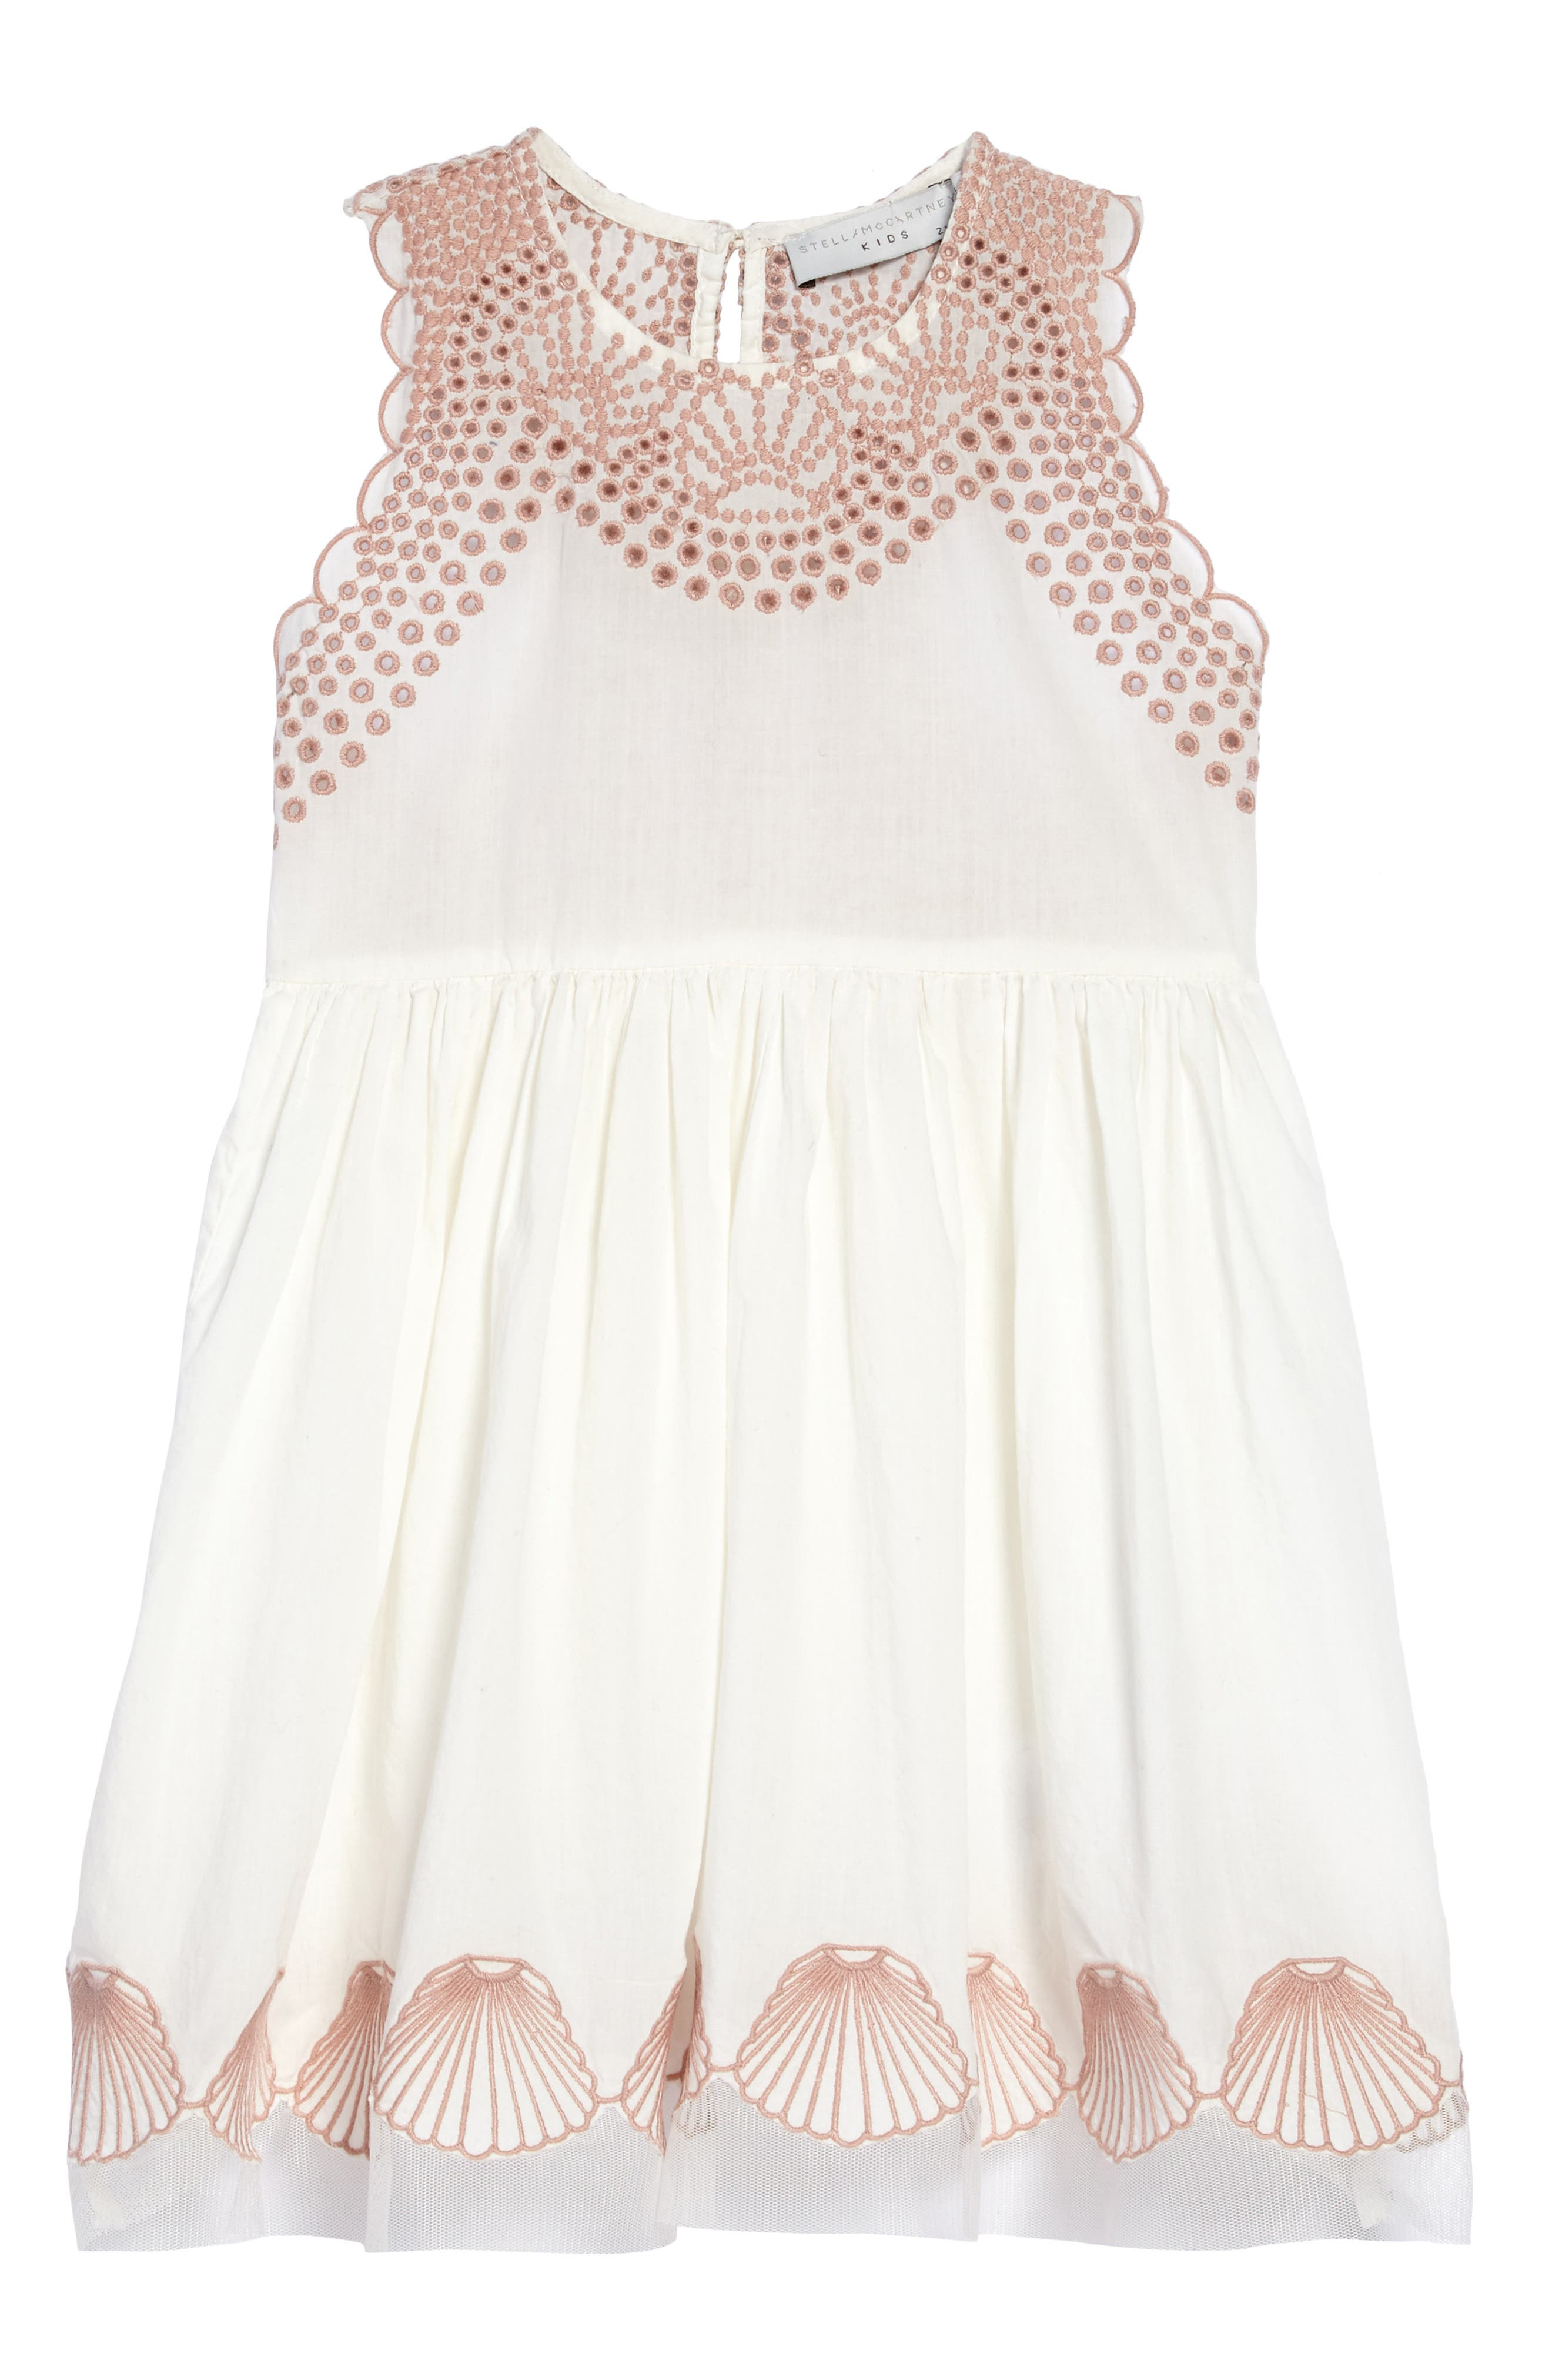 STELLA MCCARTNEY Embroidered Sleeveless Dress, Main, color, 900